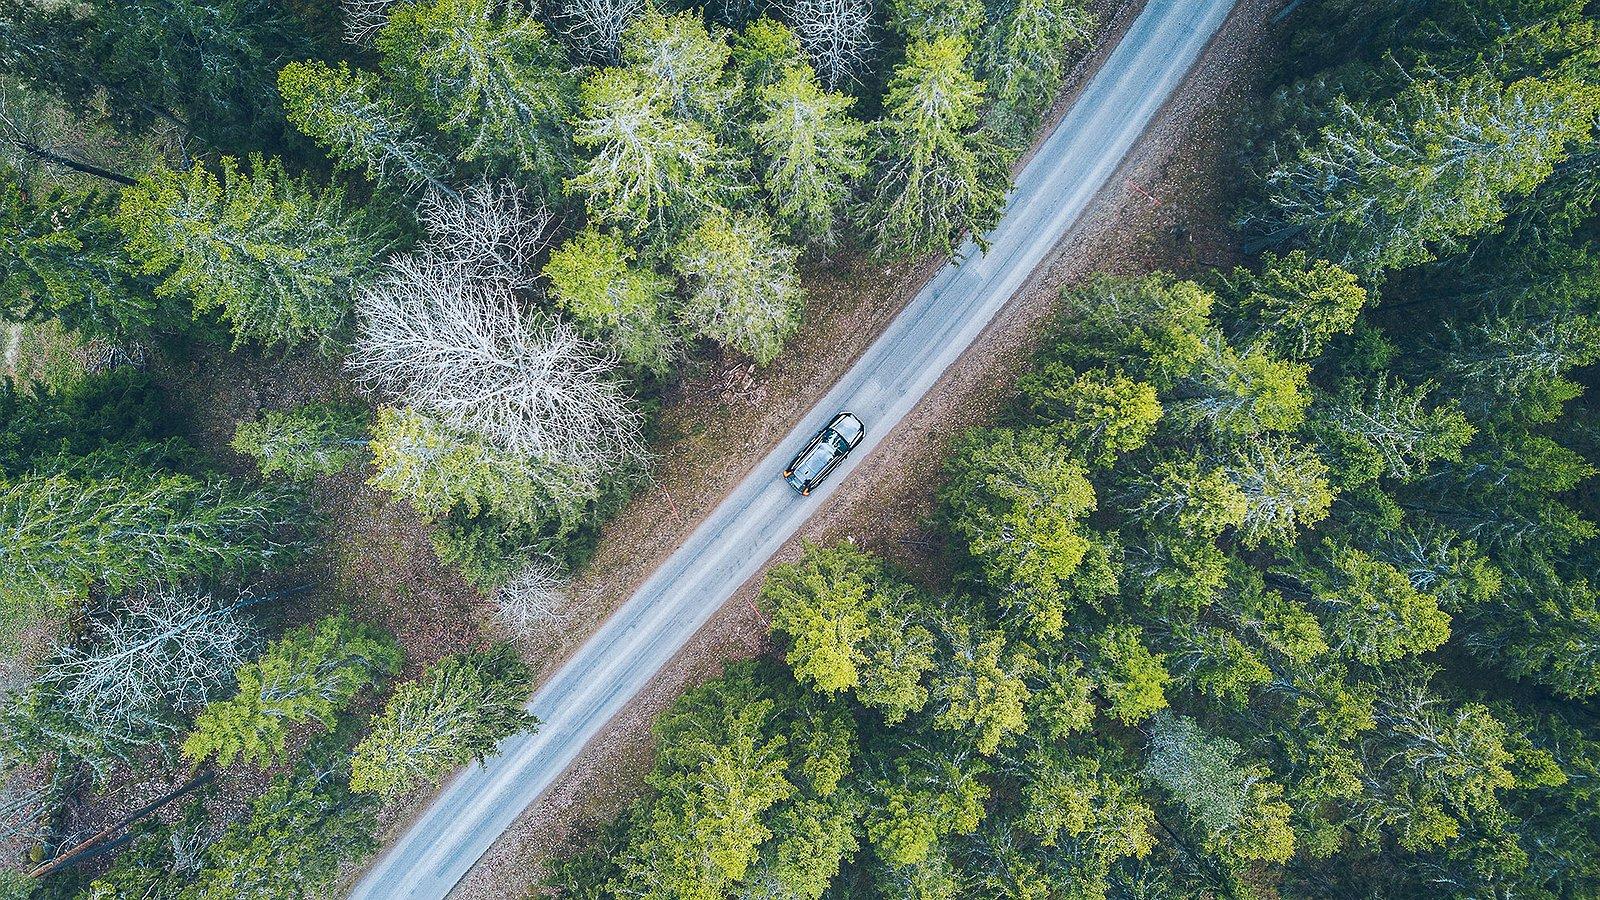 Småland Roadtripping met Jelte Sondij